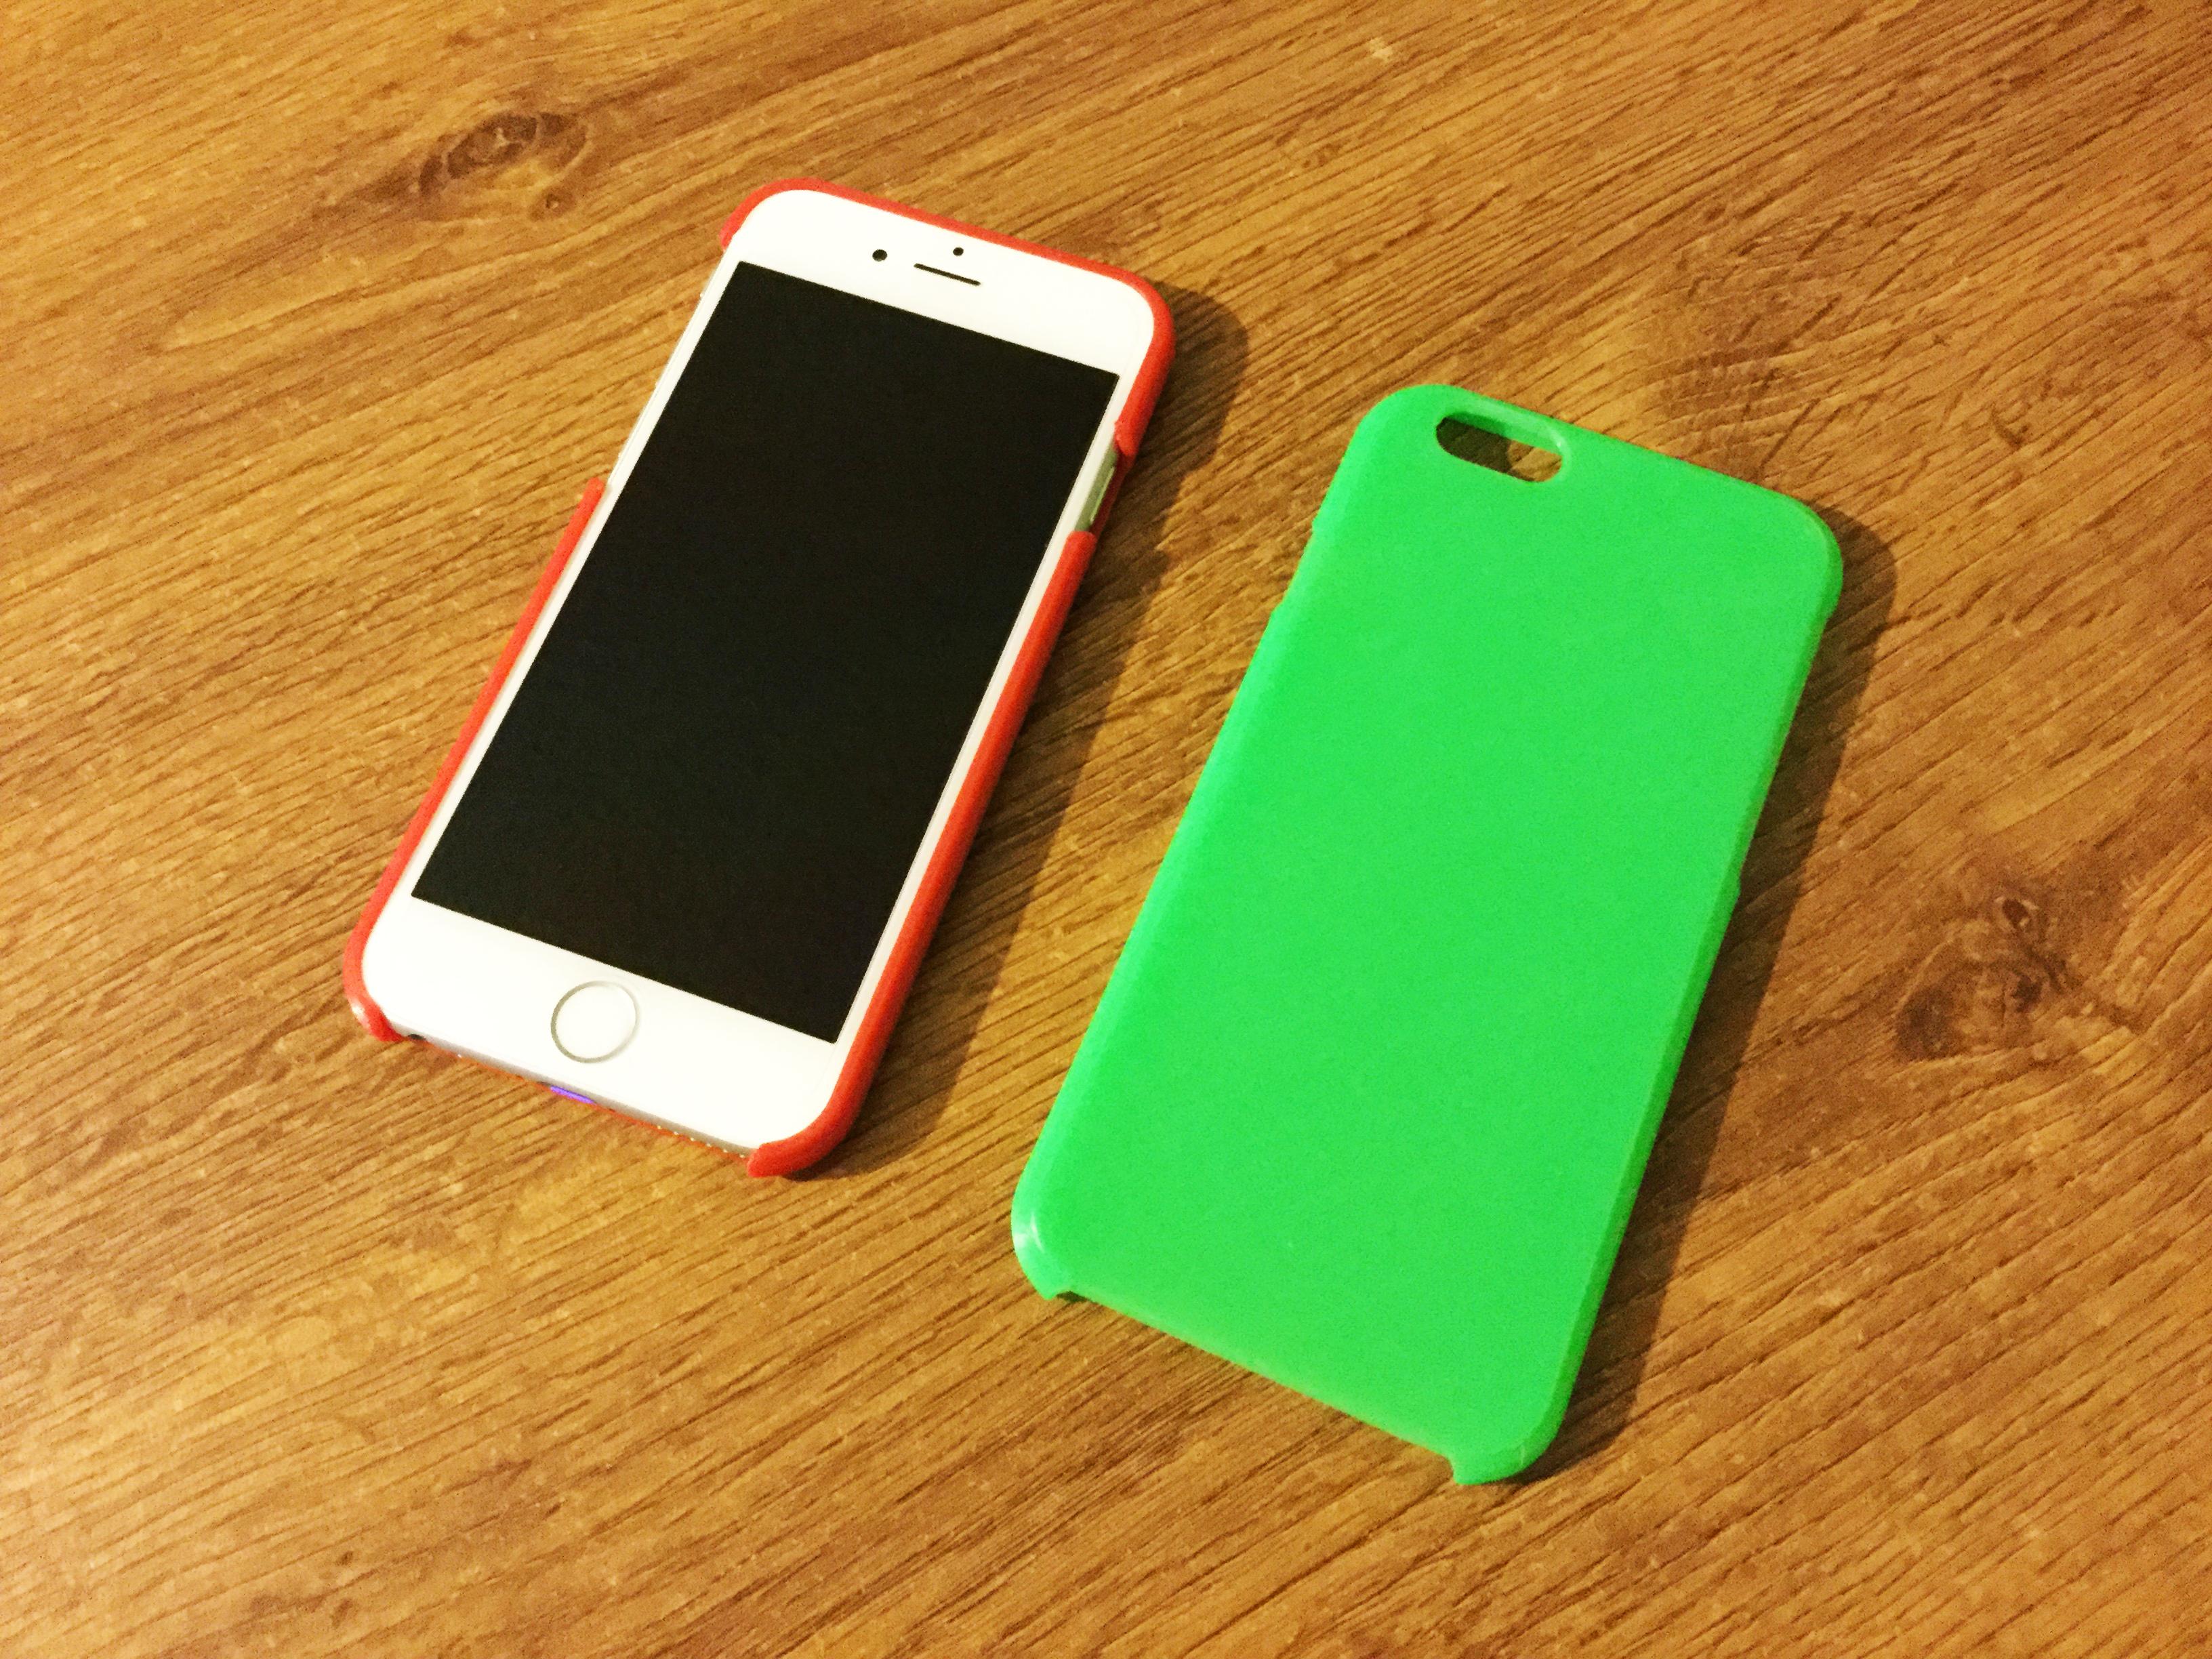 quality design 502db fb1b9 iPhone 6 slim case (blank) @ Pinshape